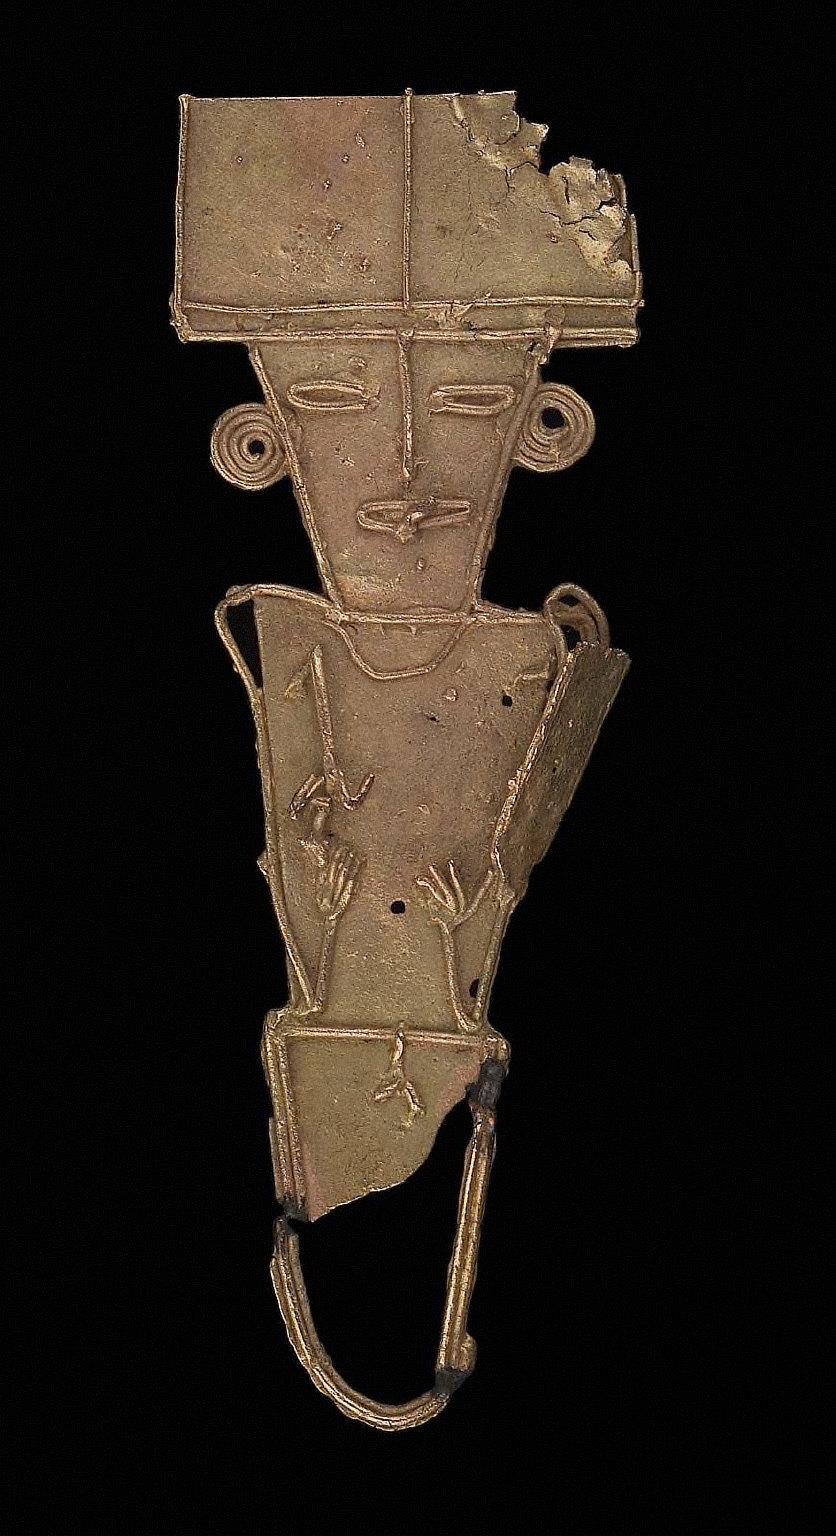 Male effigy figure holding spearthrower